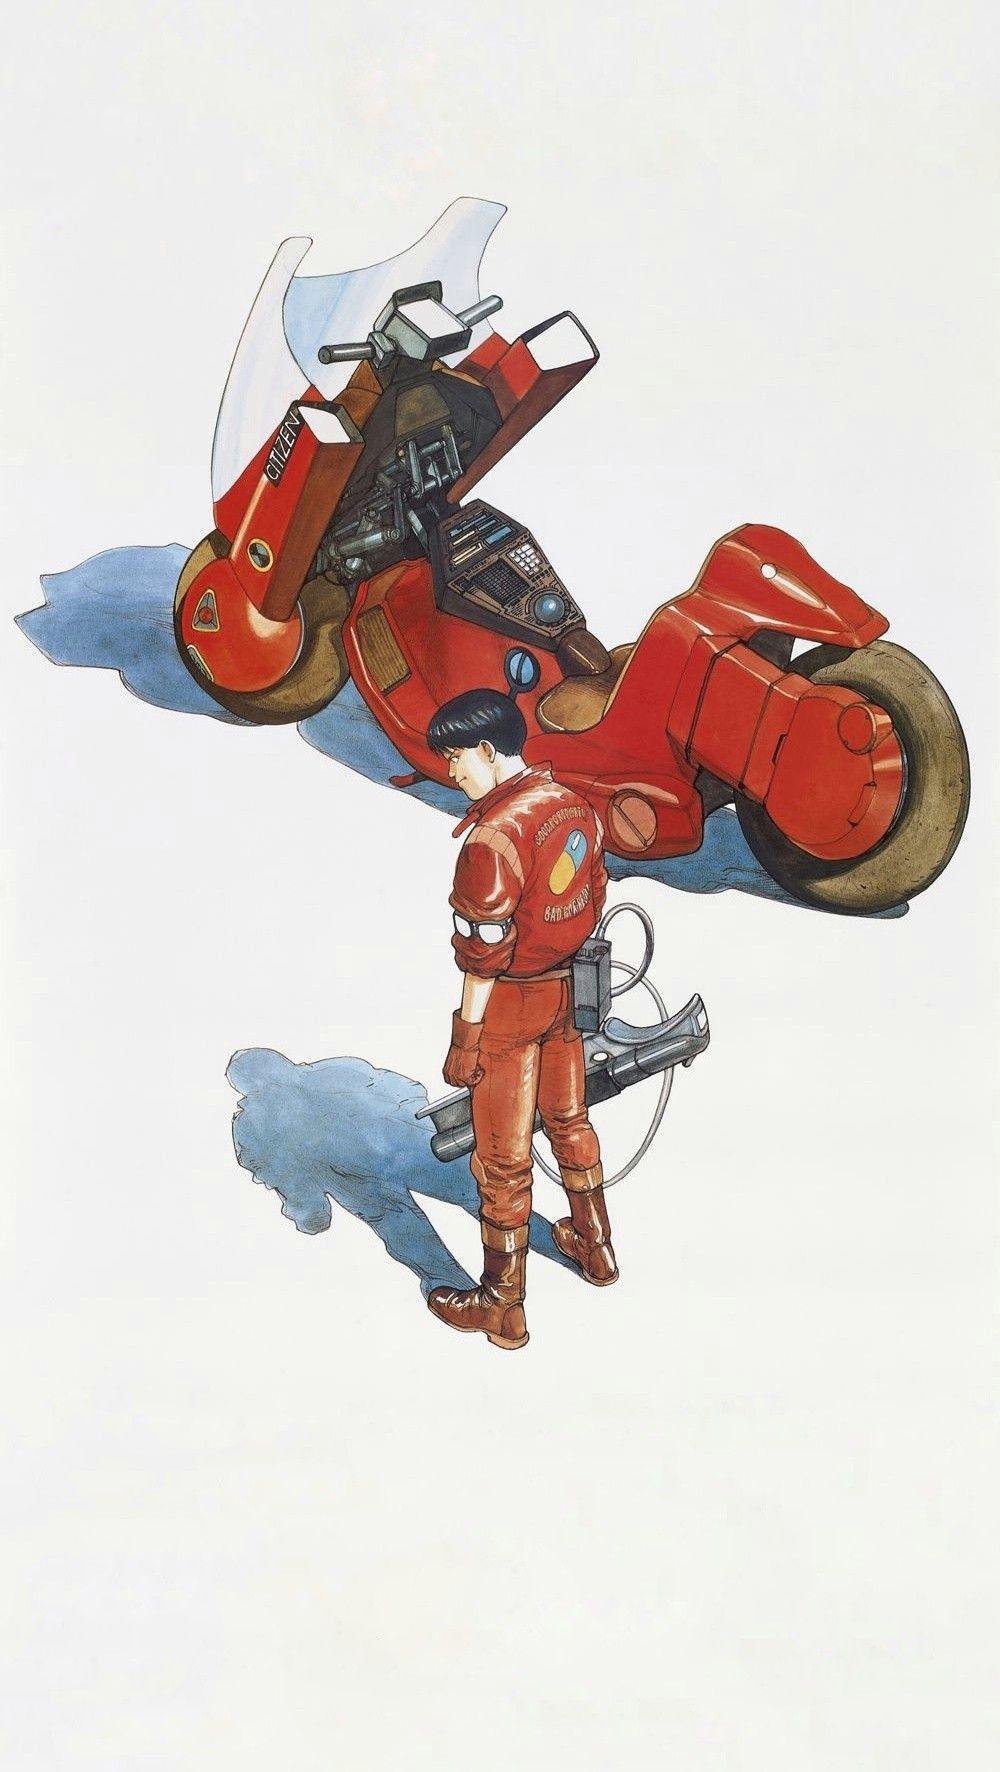 Akira Wallpaper Anime Clean Moto Akira Anime Akira Manga Akira Poster